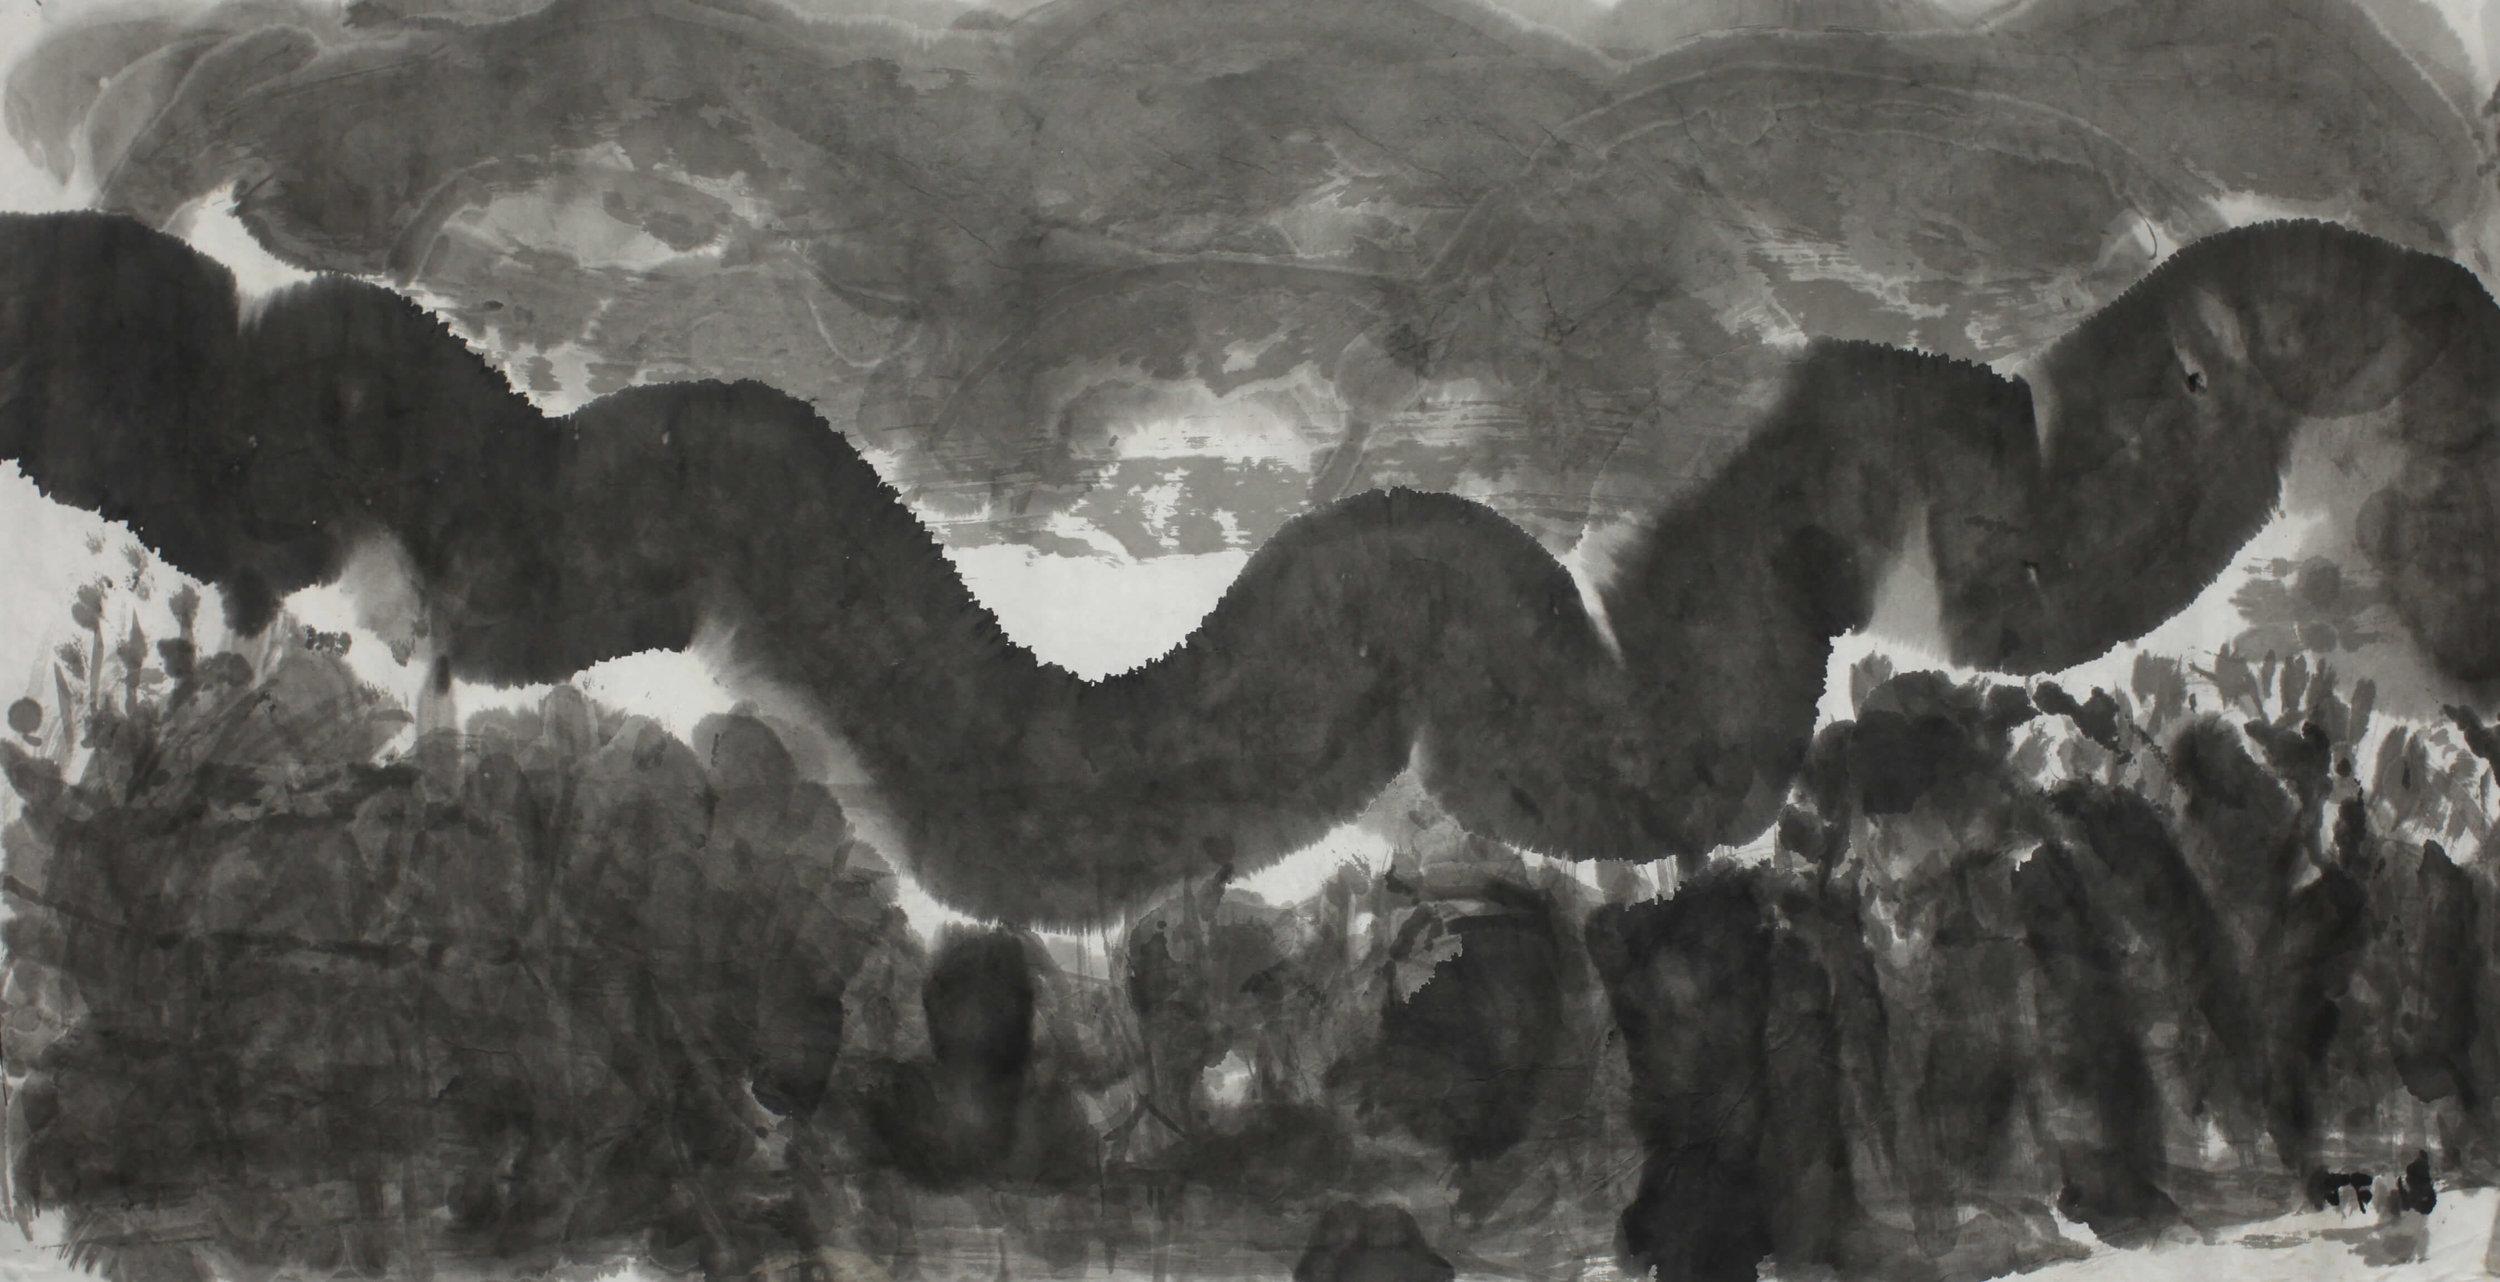 Joe Furlonger_Misty Morning Spring_2018_ink on paper_70x136.5cm_11,000AUD.JPG